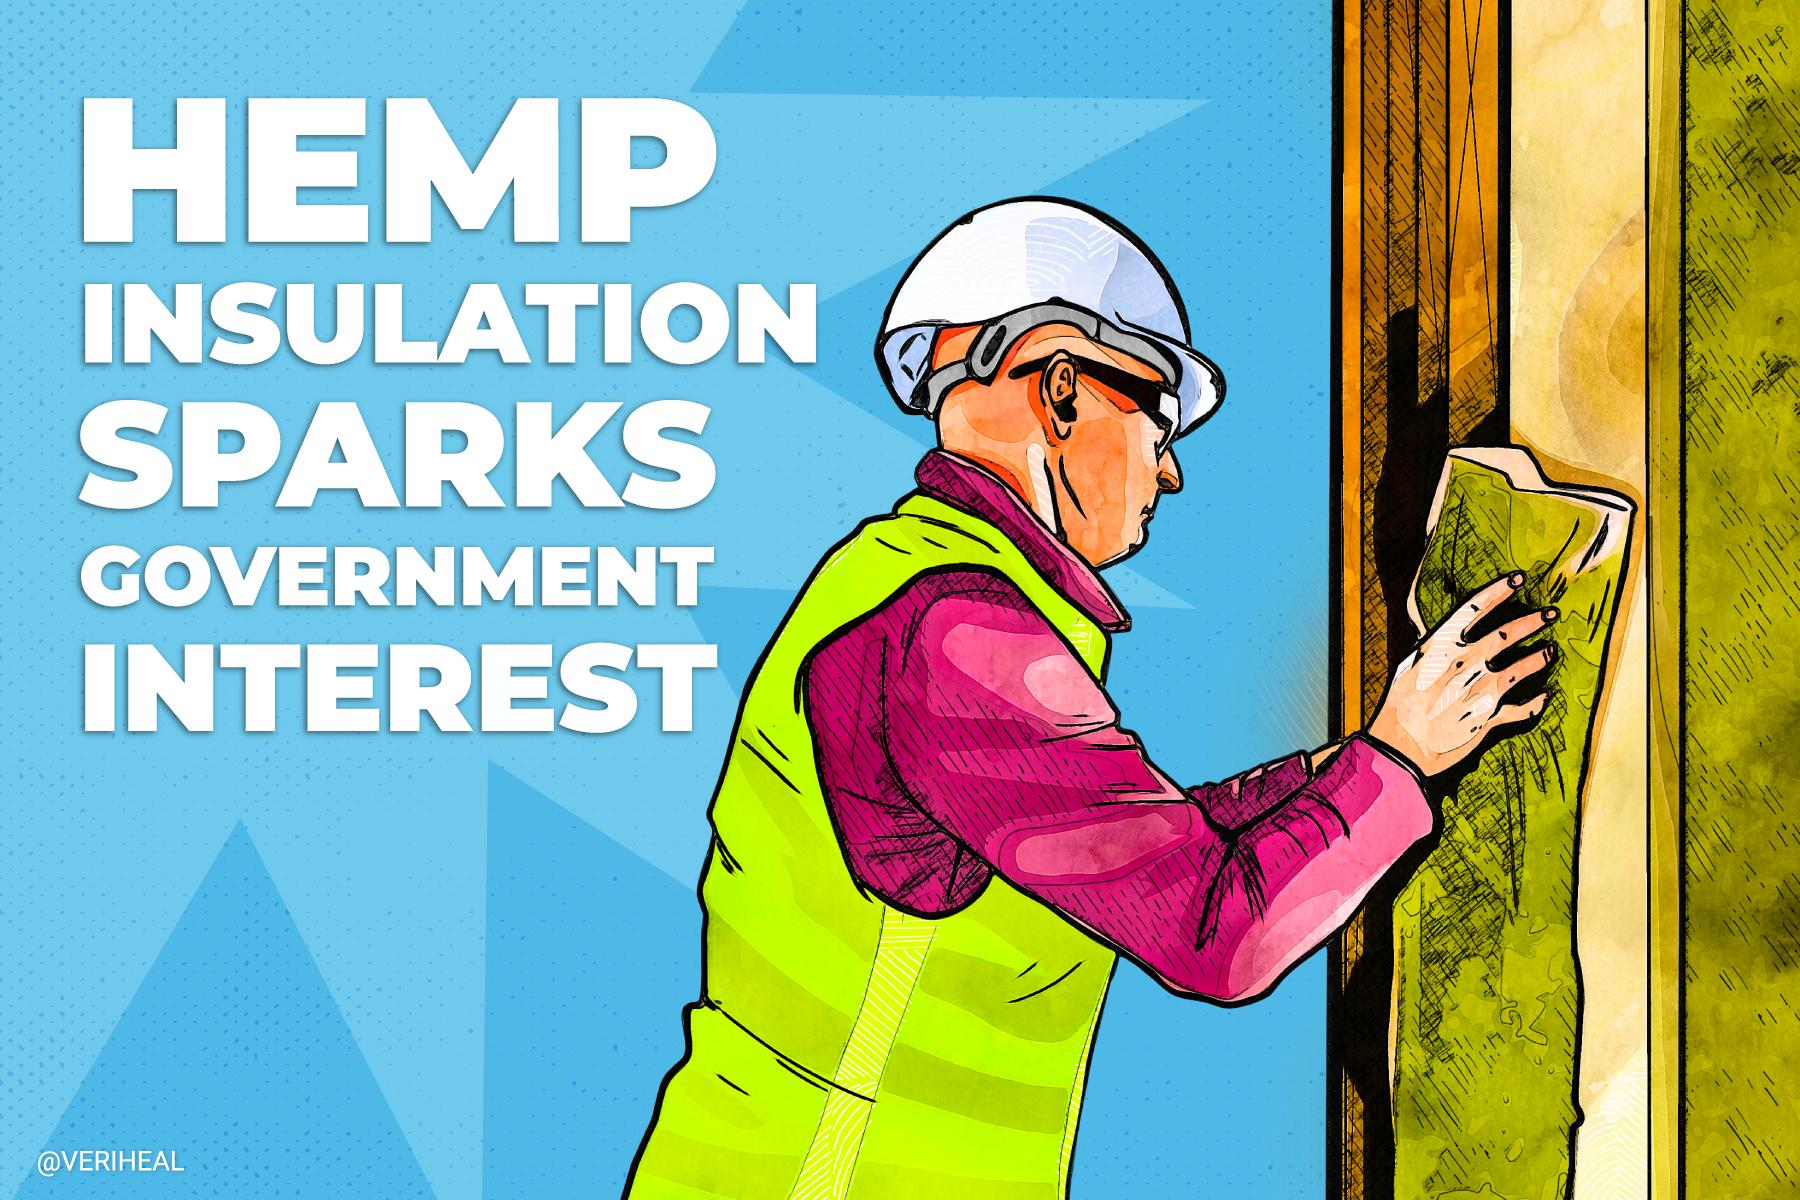 Hemp Insulation Sparks Government Interest